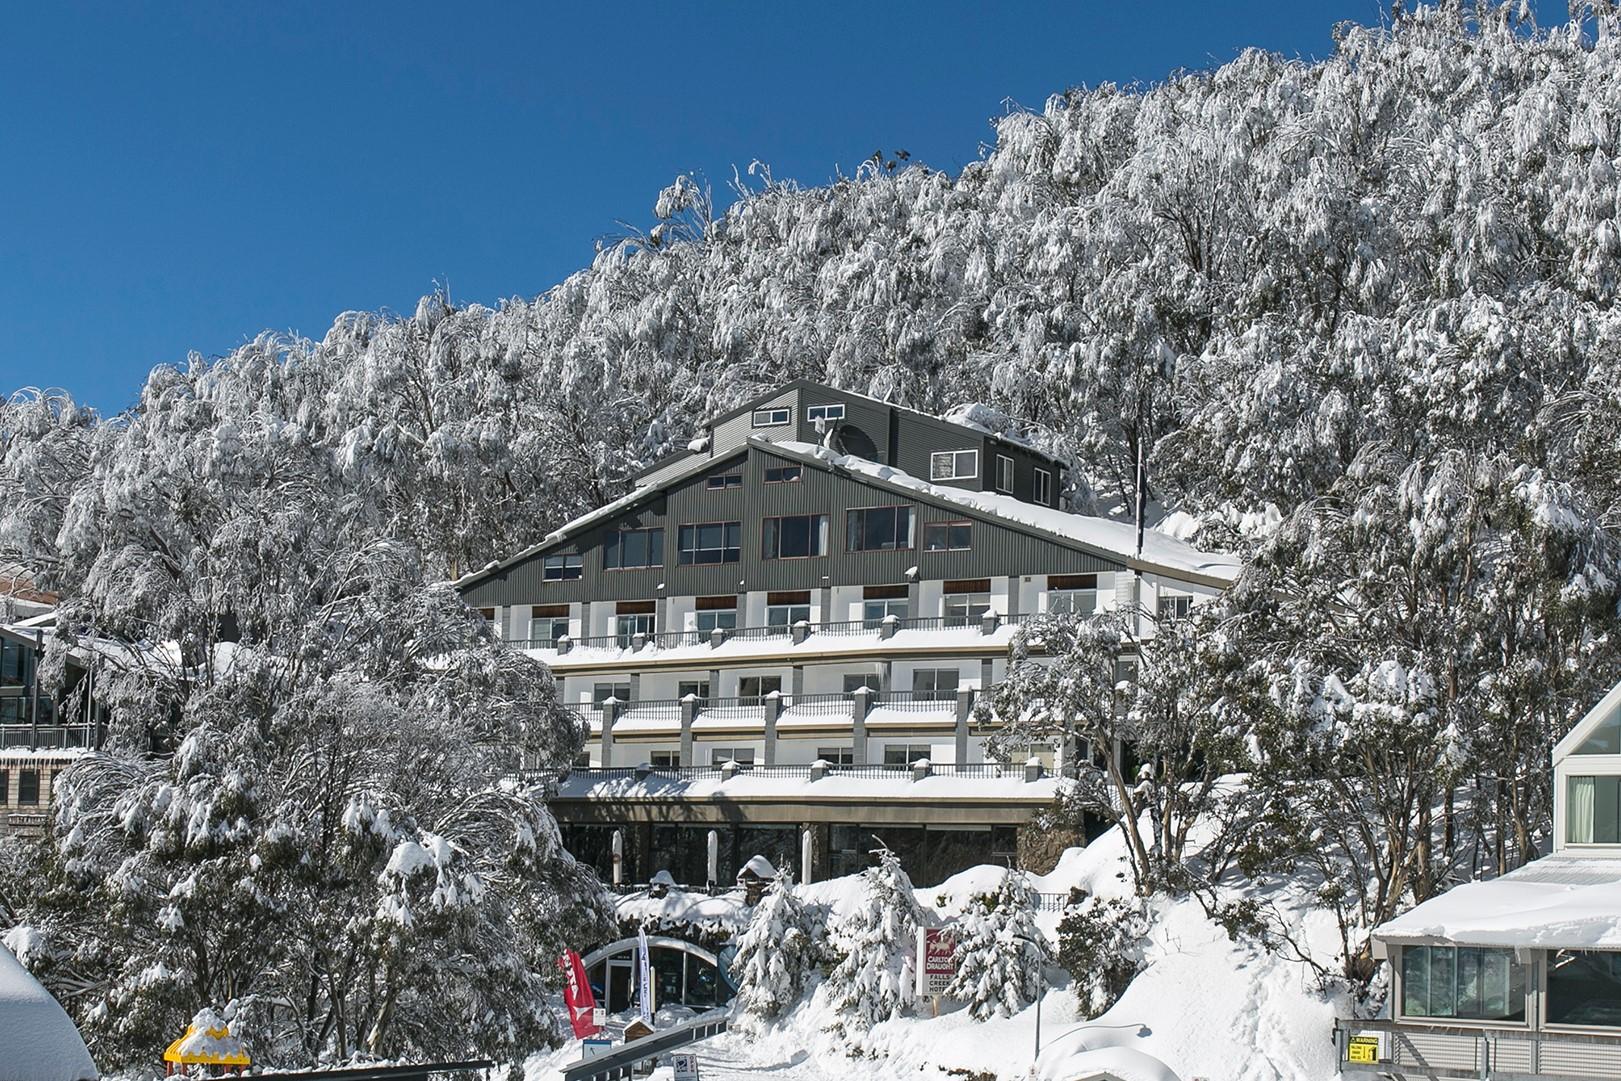 falls creek hotel | falls creek snow holidays